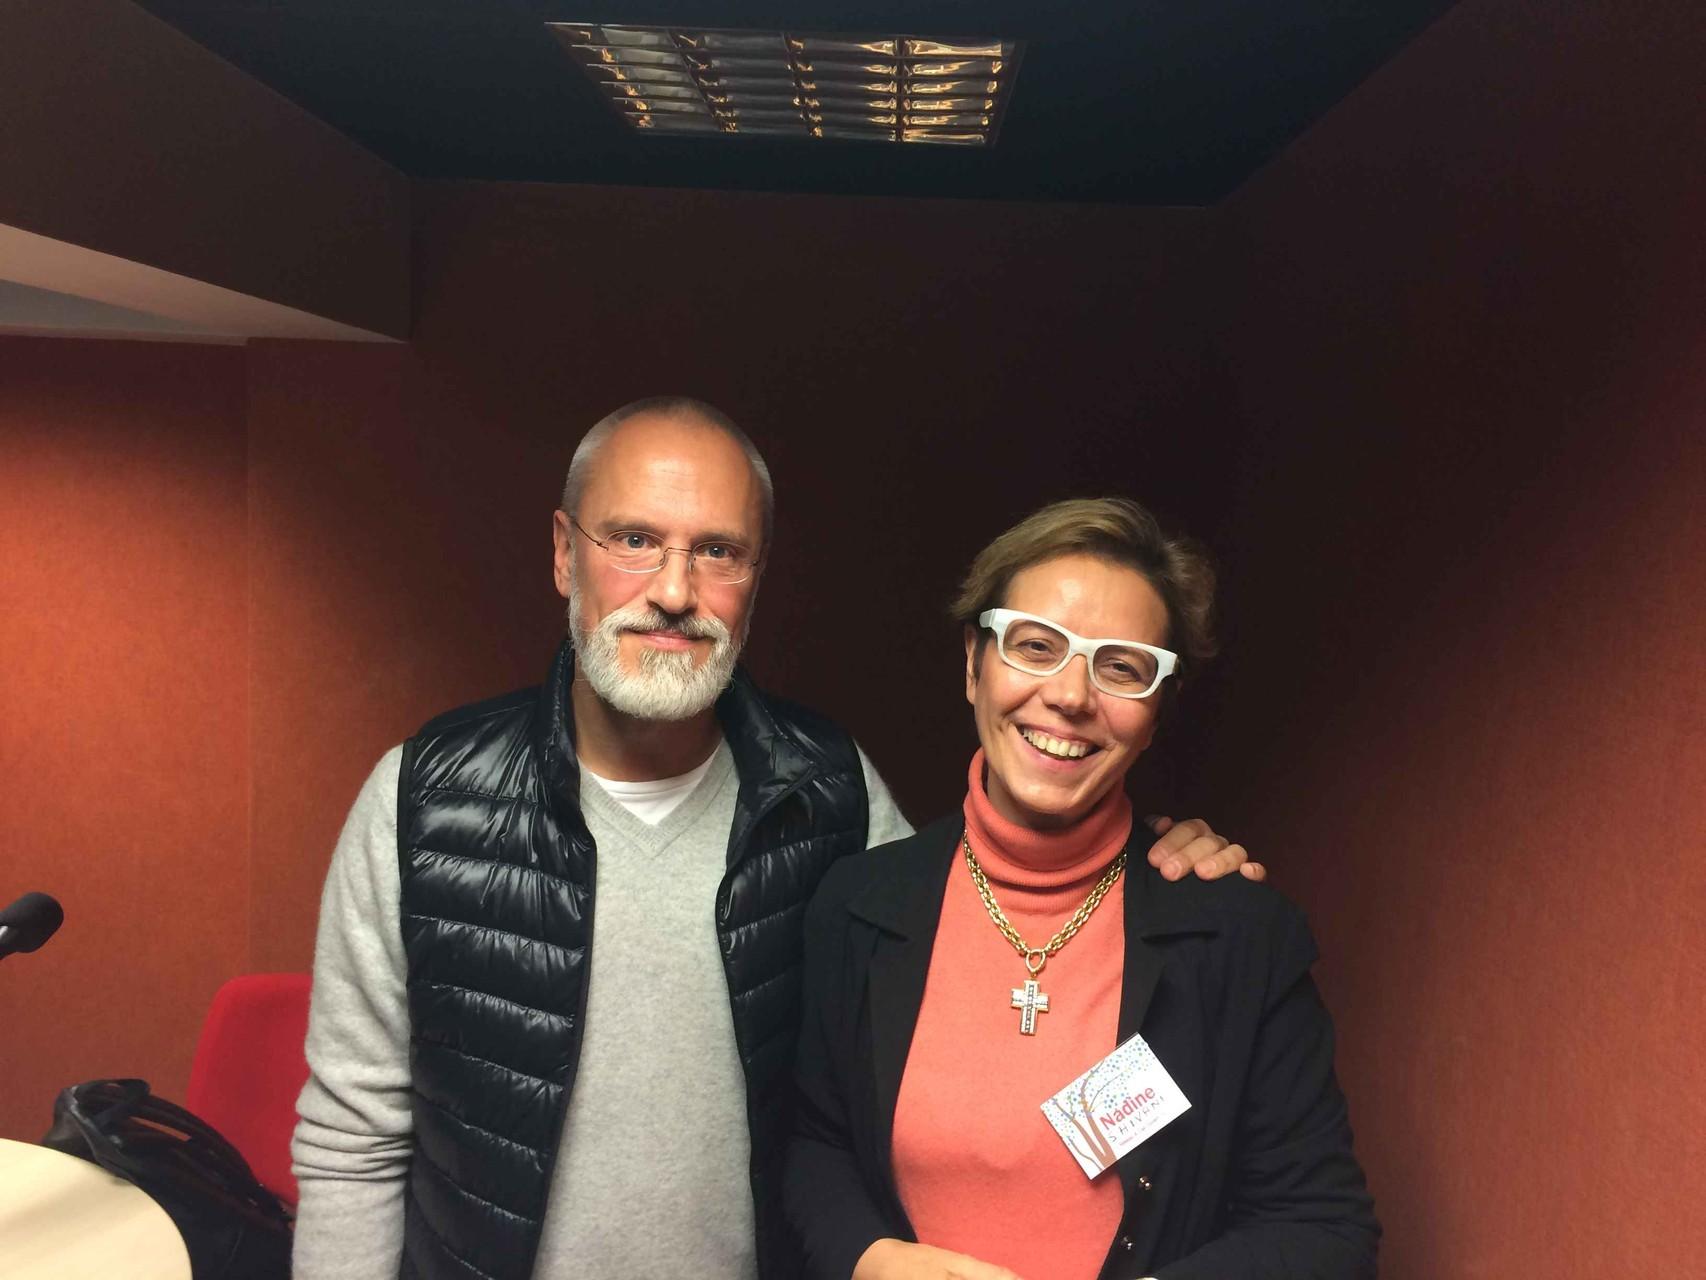 Shivani avec Thierry Janssen